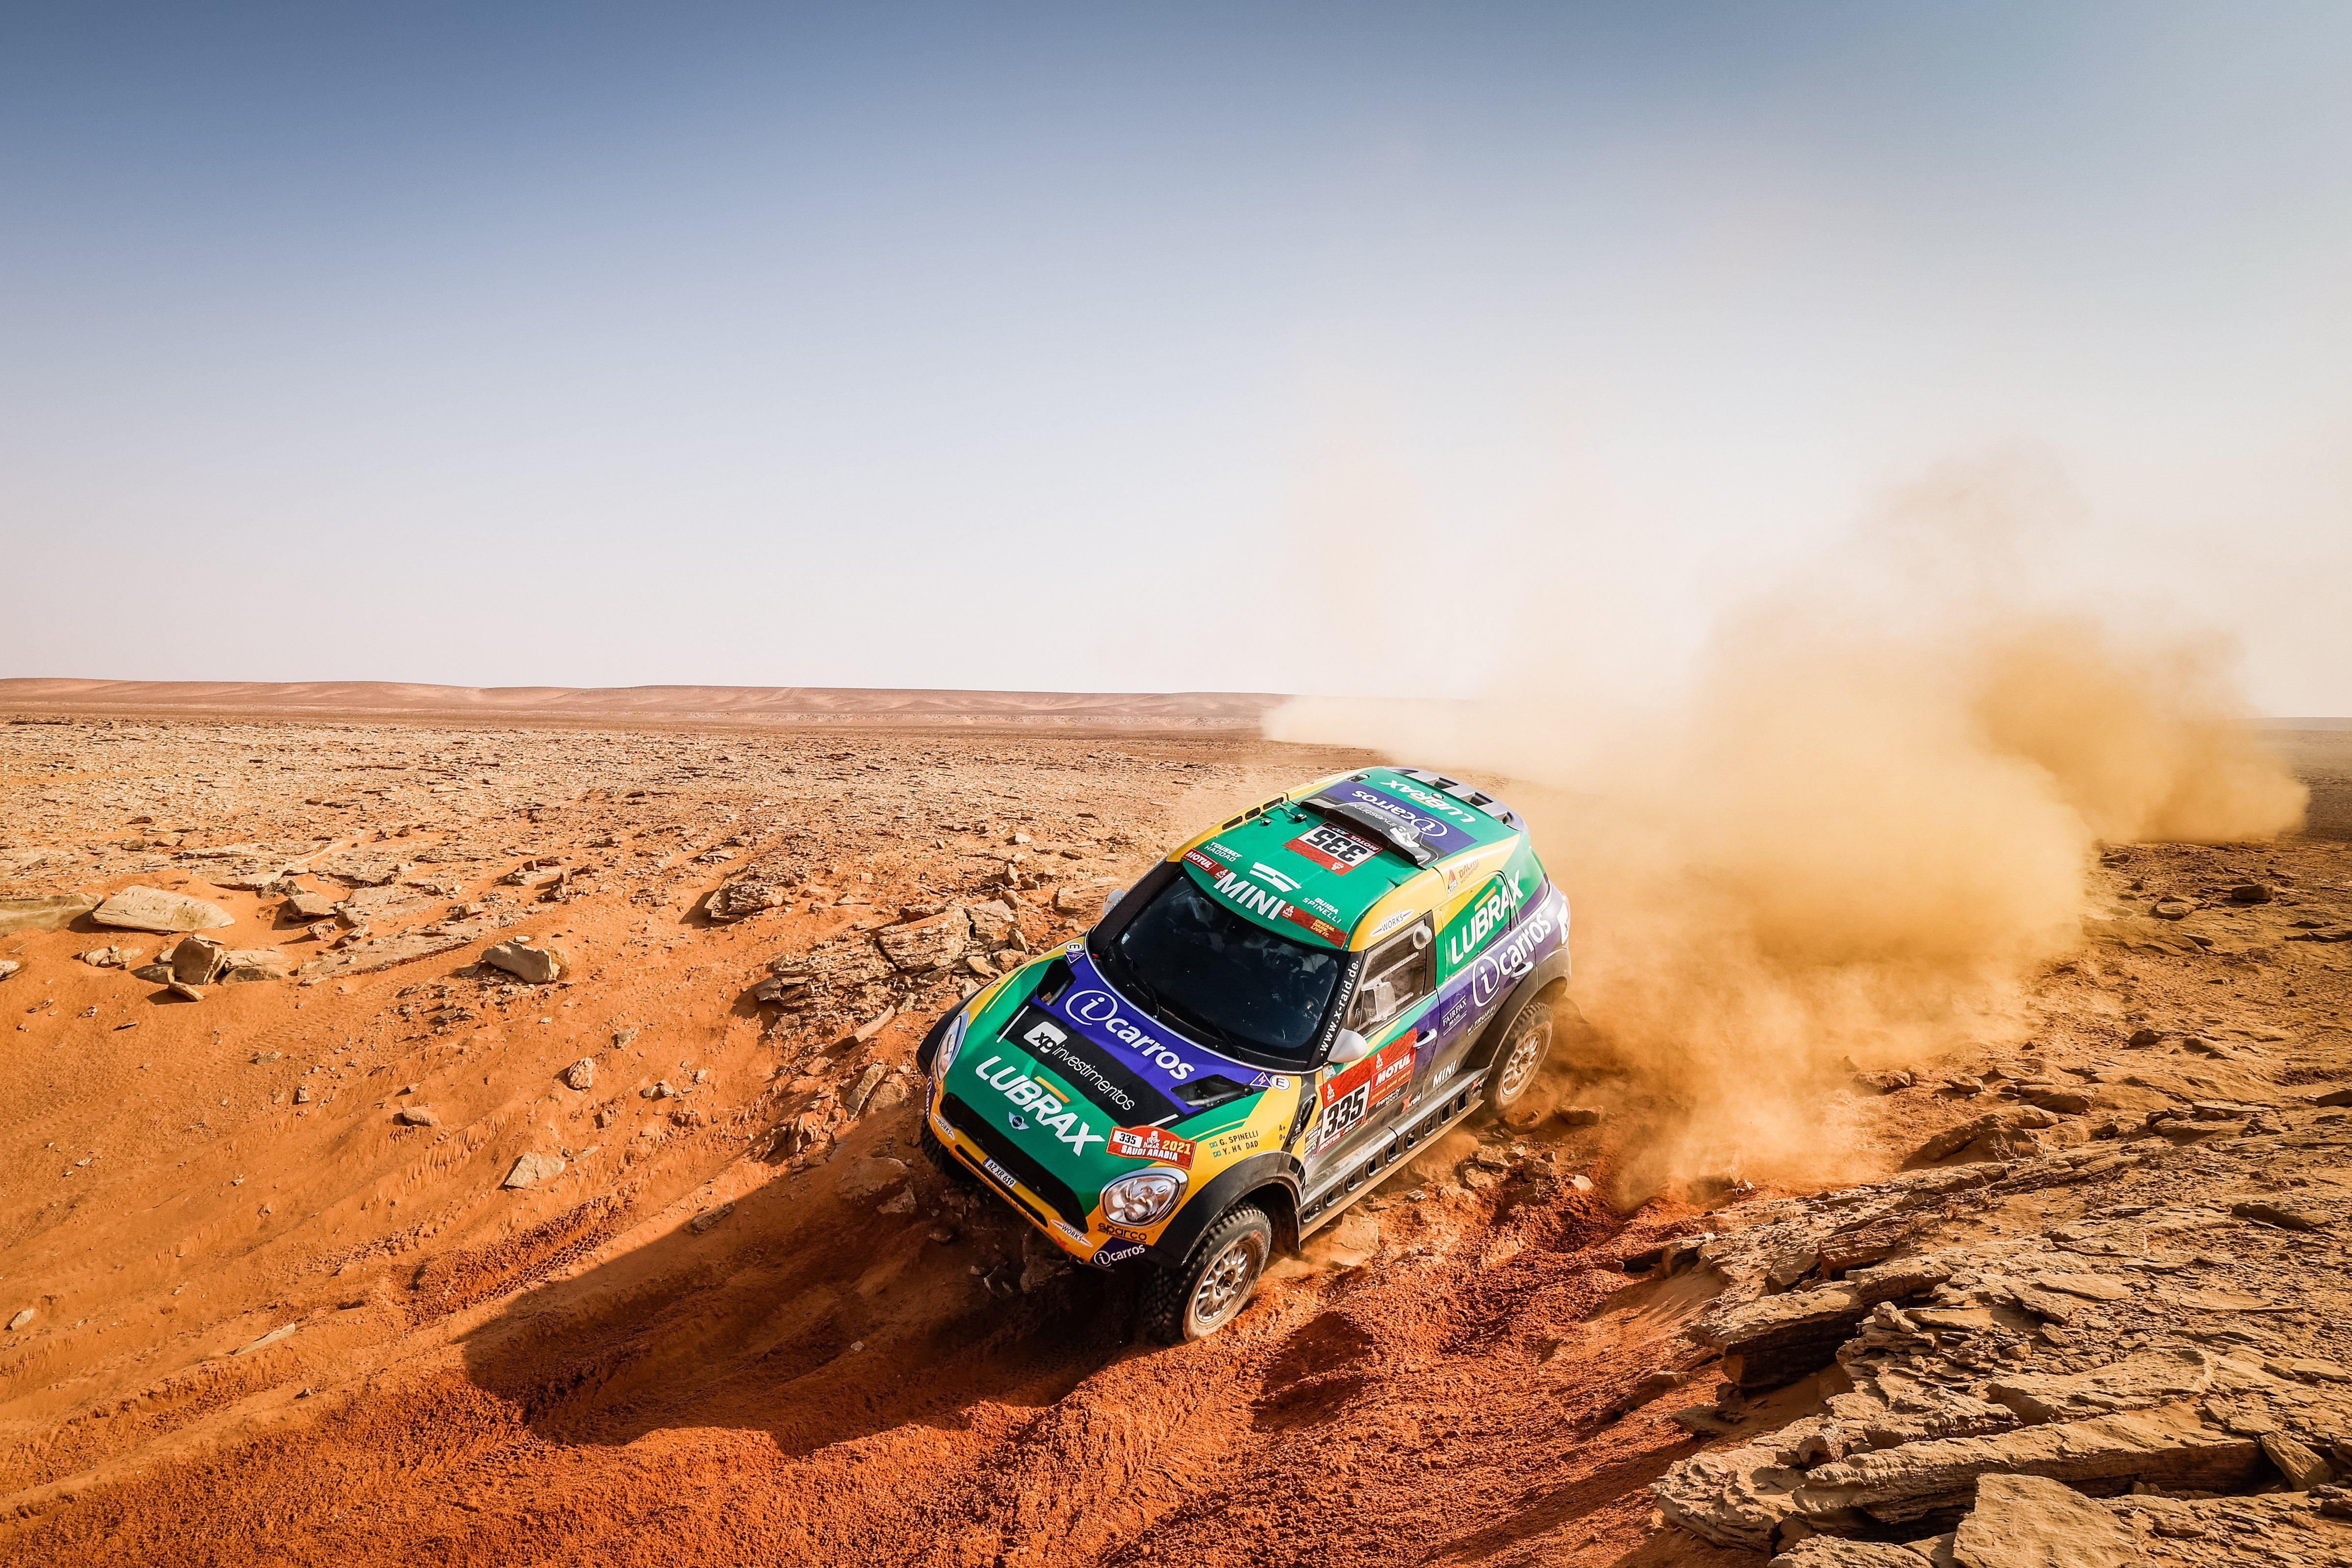 rally-dakar-2021-6eme-victoire-au-general-pour-mini-1416-6.jpg